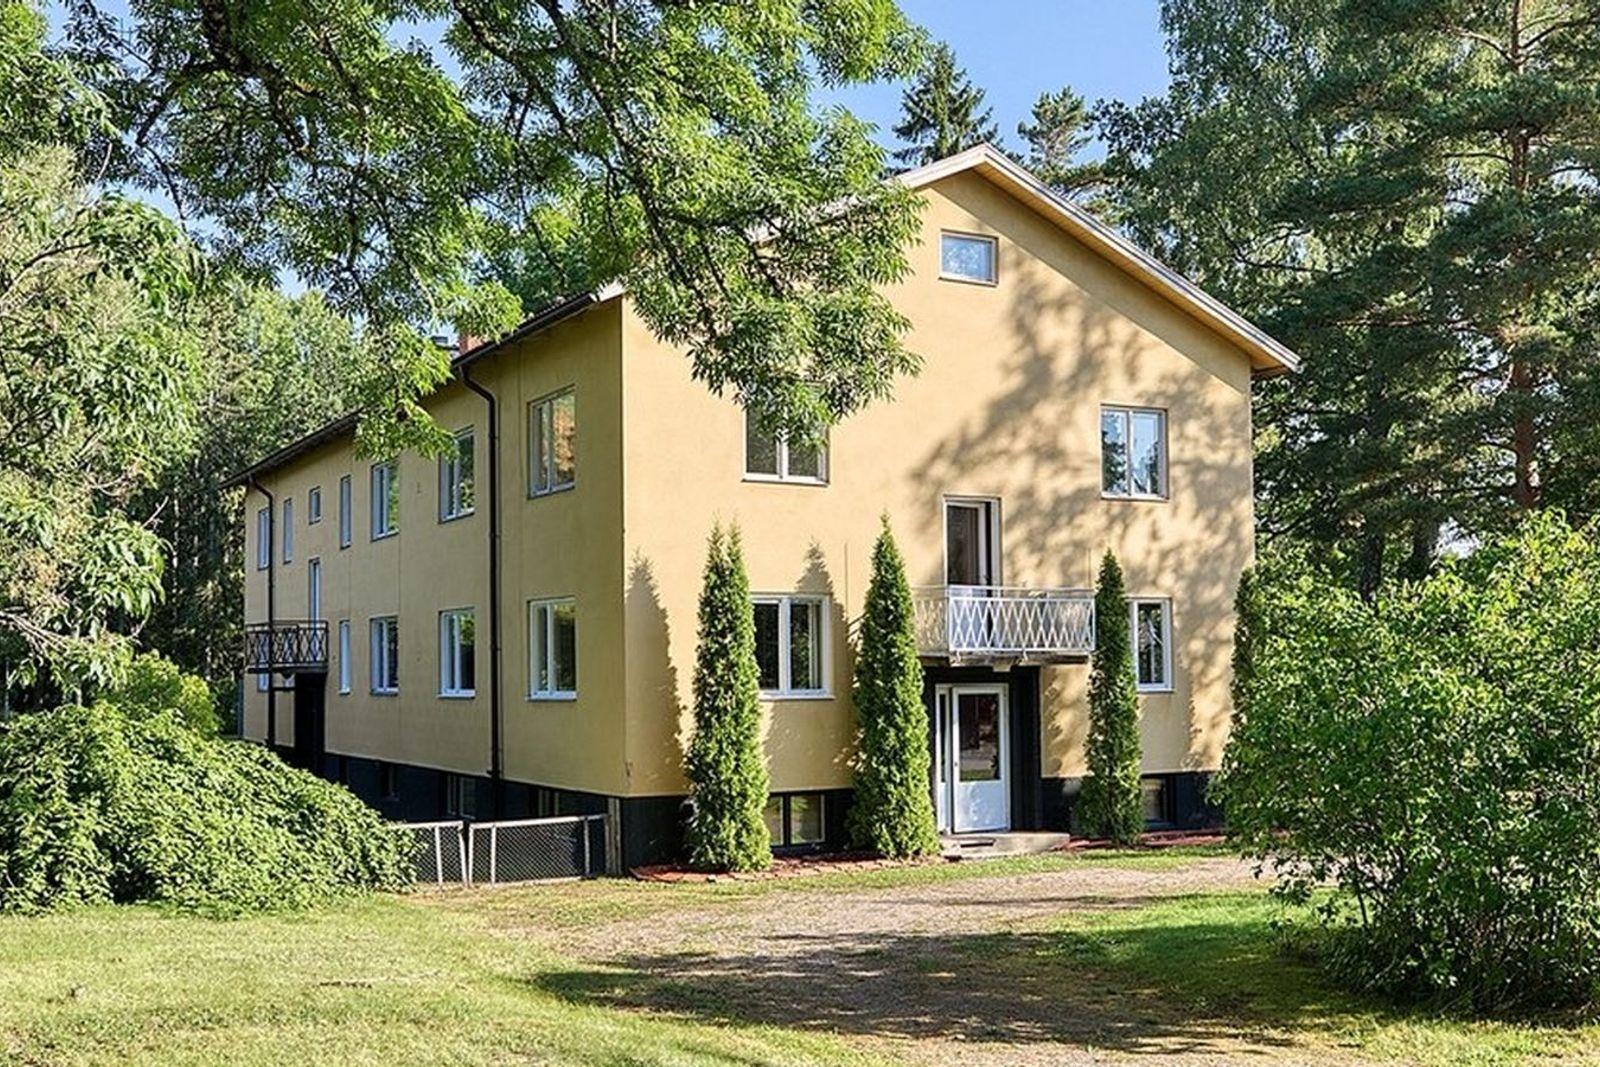 Nyinflyttade på Edströms väg 10A, Hälleforsnäs | streetanthemrecords.com